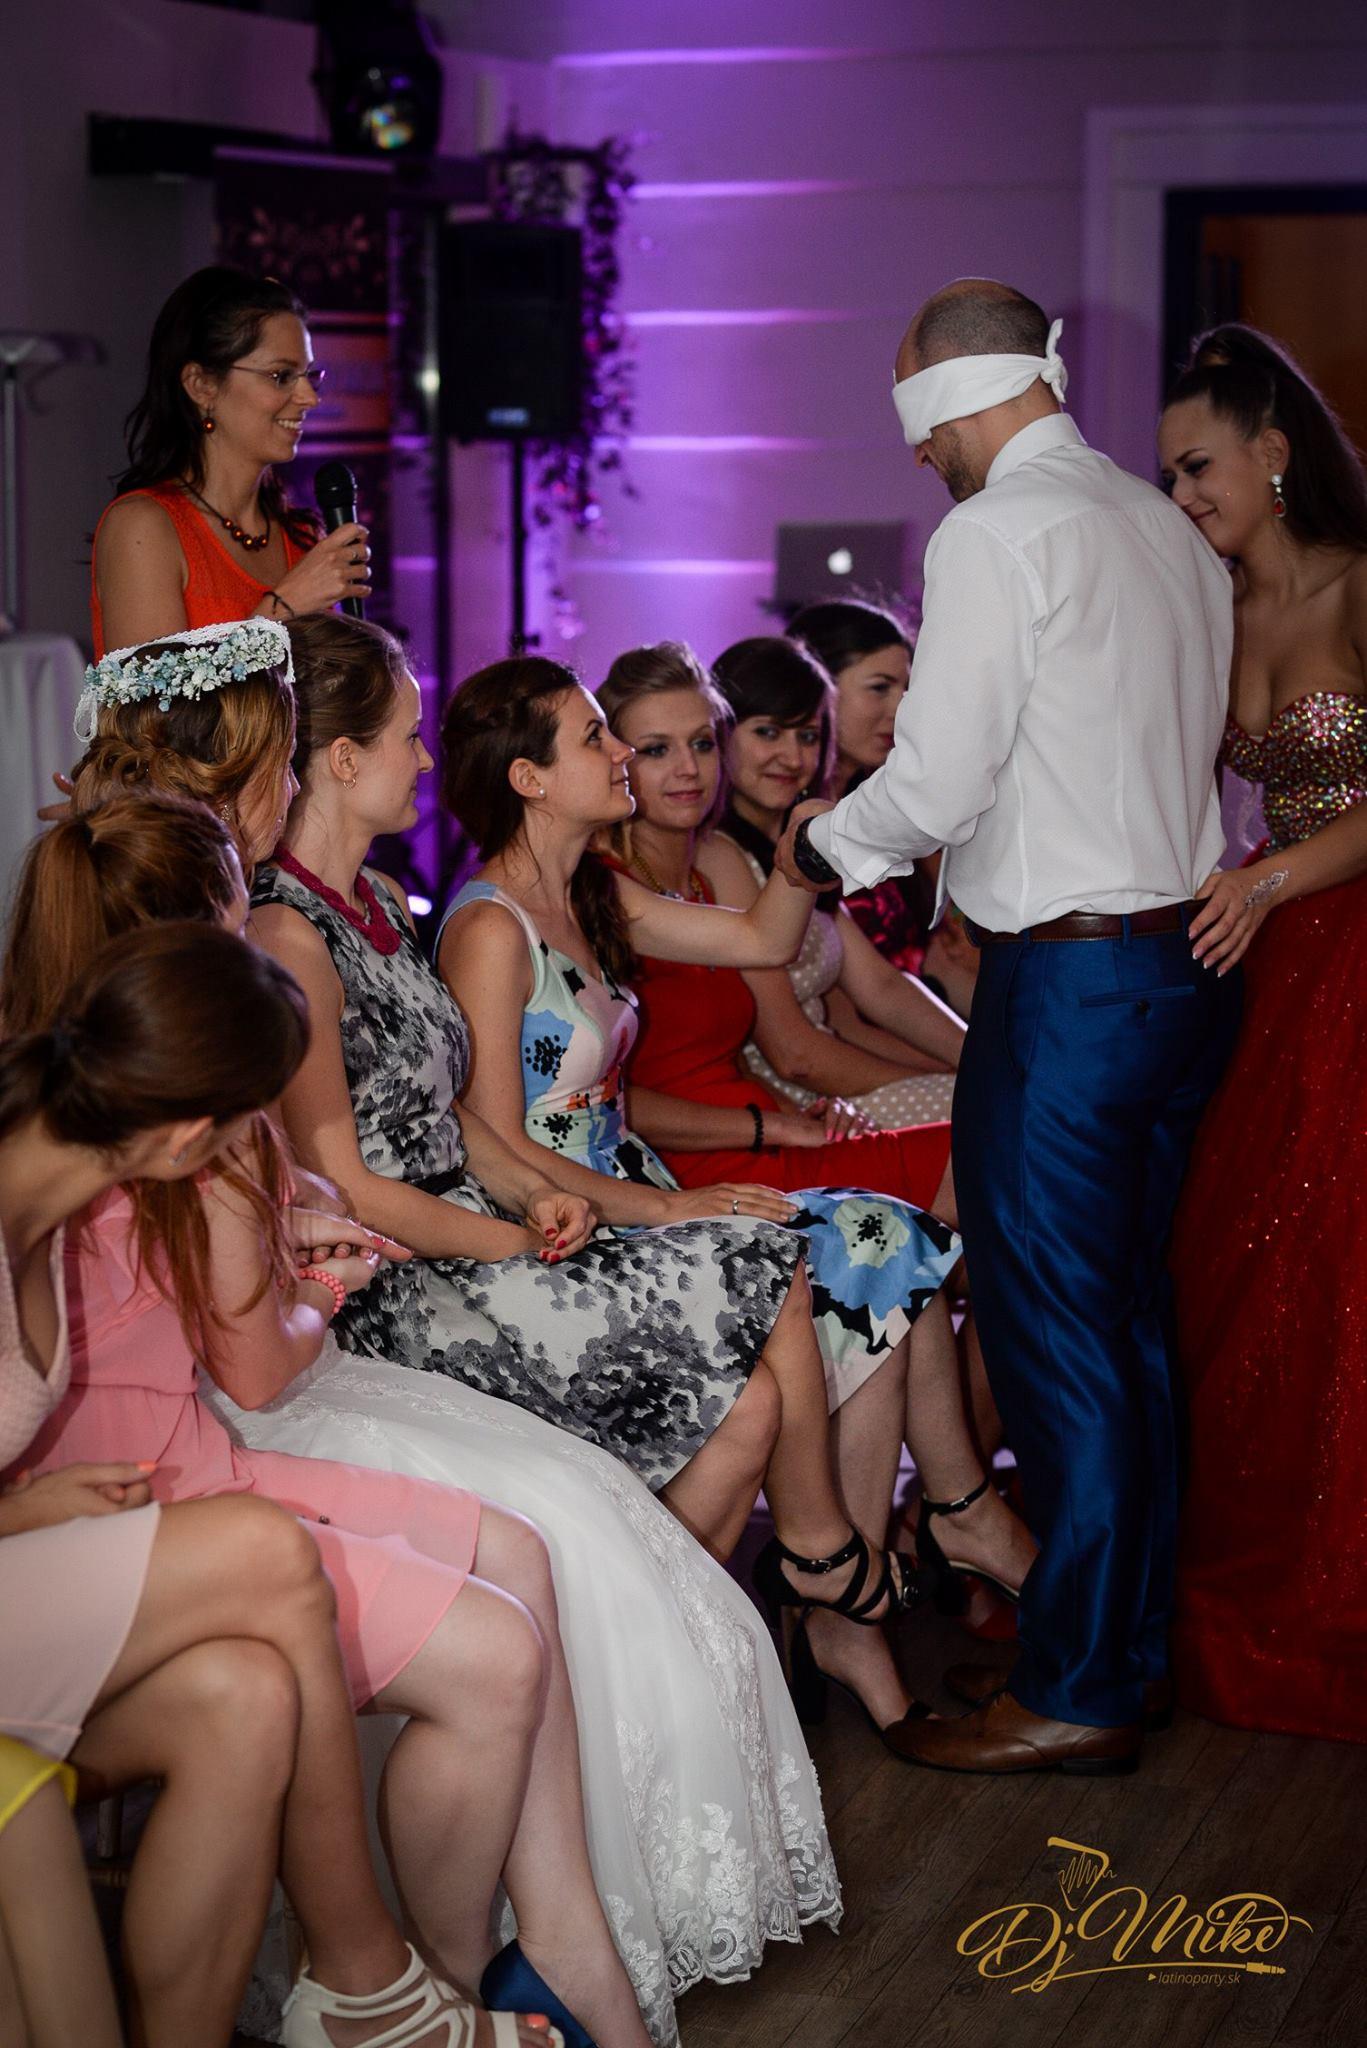 svadobne hry dj mikejpg